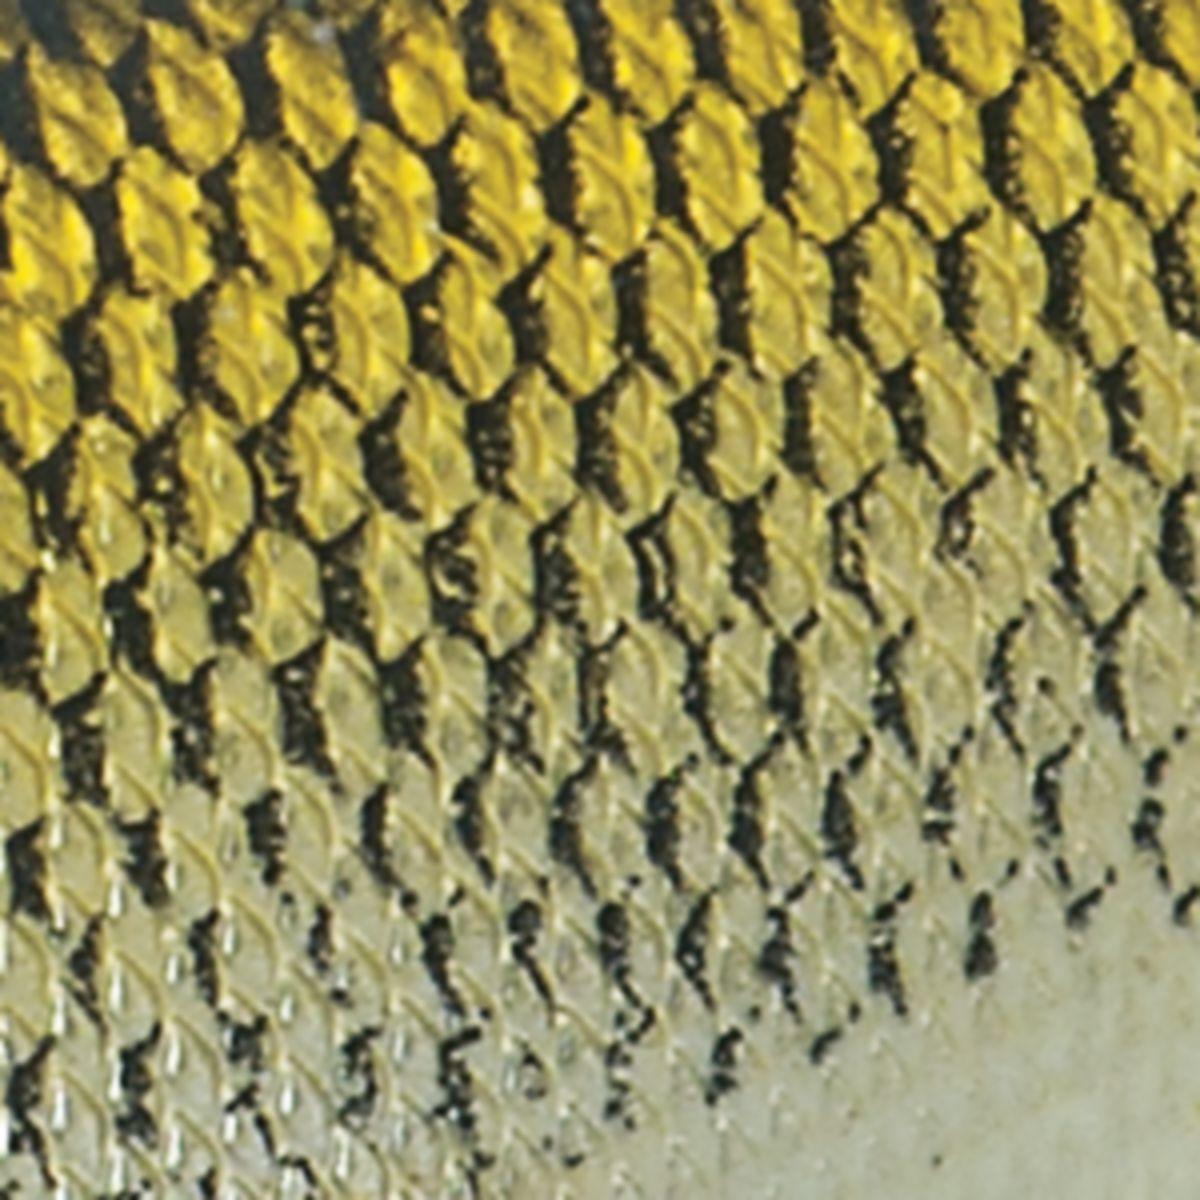 Livetarget® Golden Shiner Rattlebait